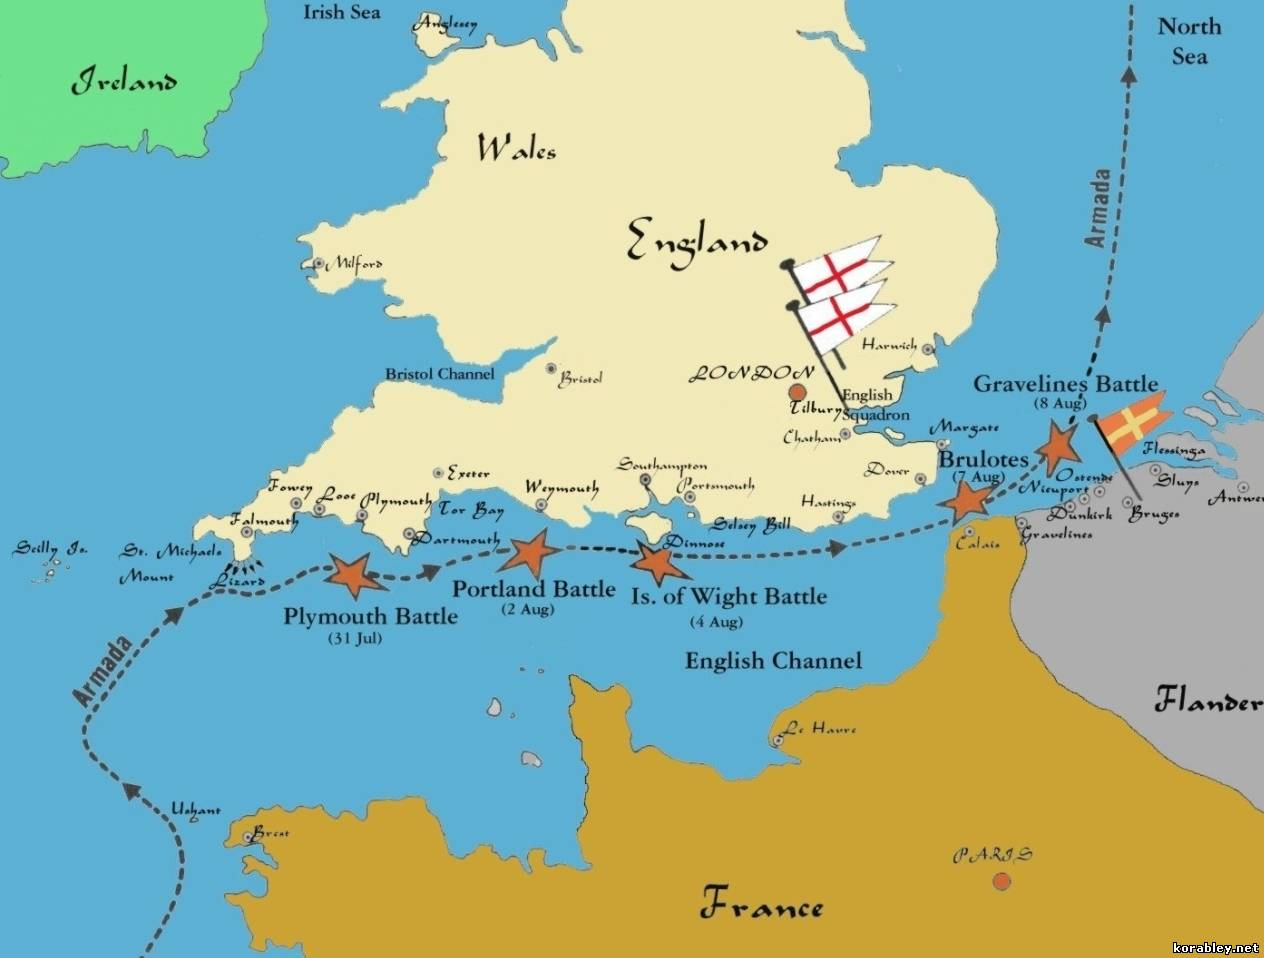 the battle of the spanish armada